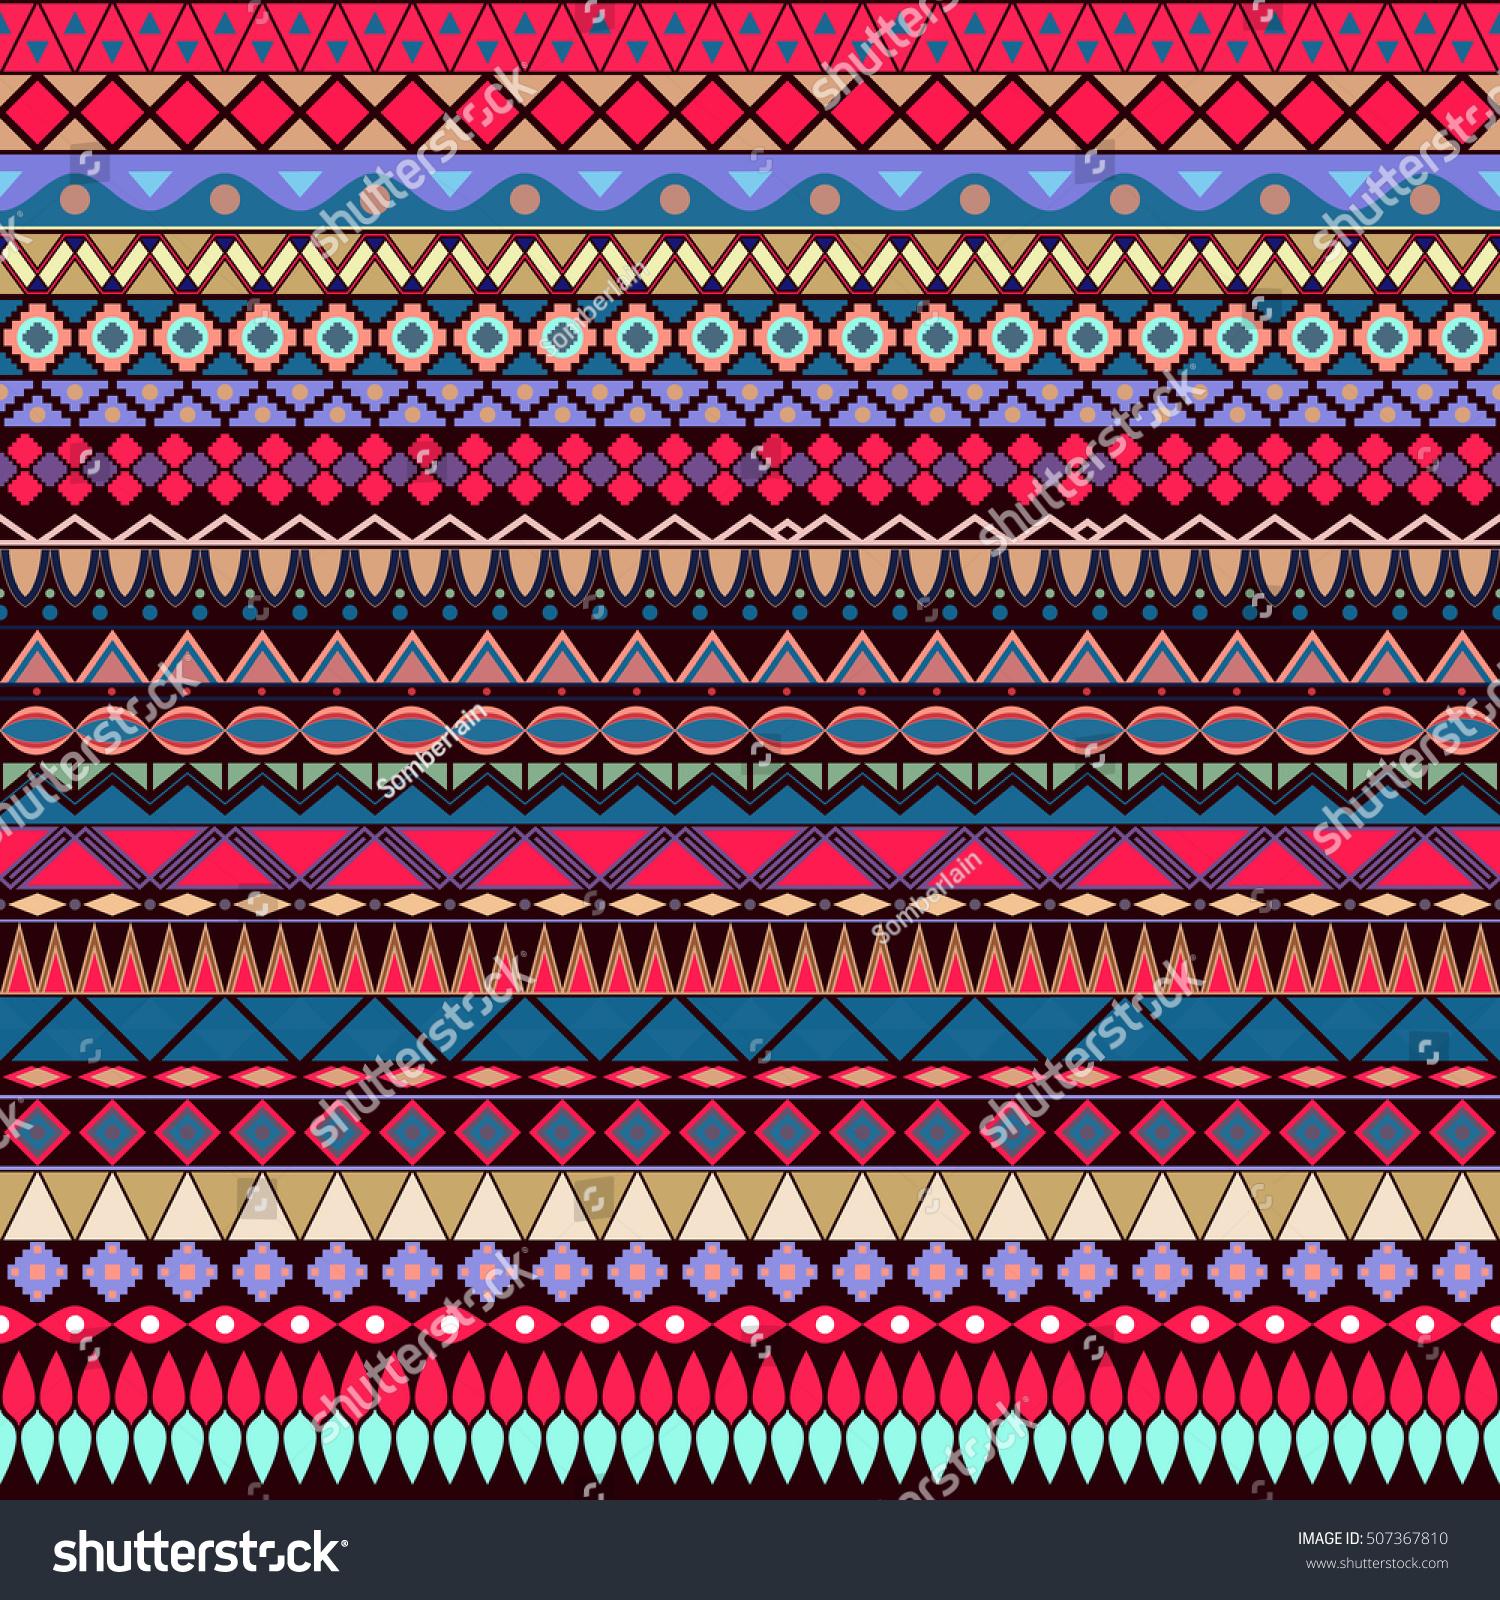 Colorful Tribal Print Wallpaper